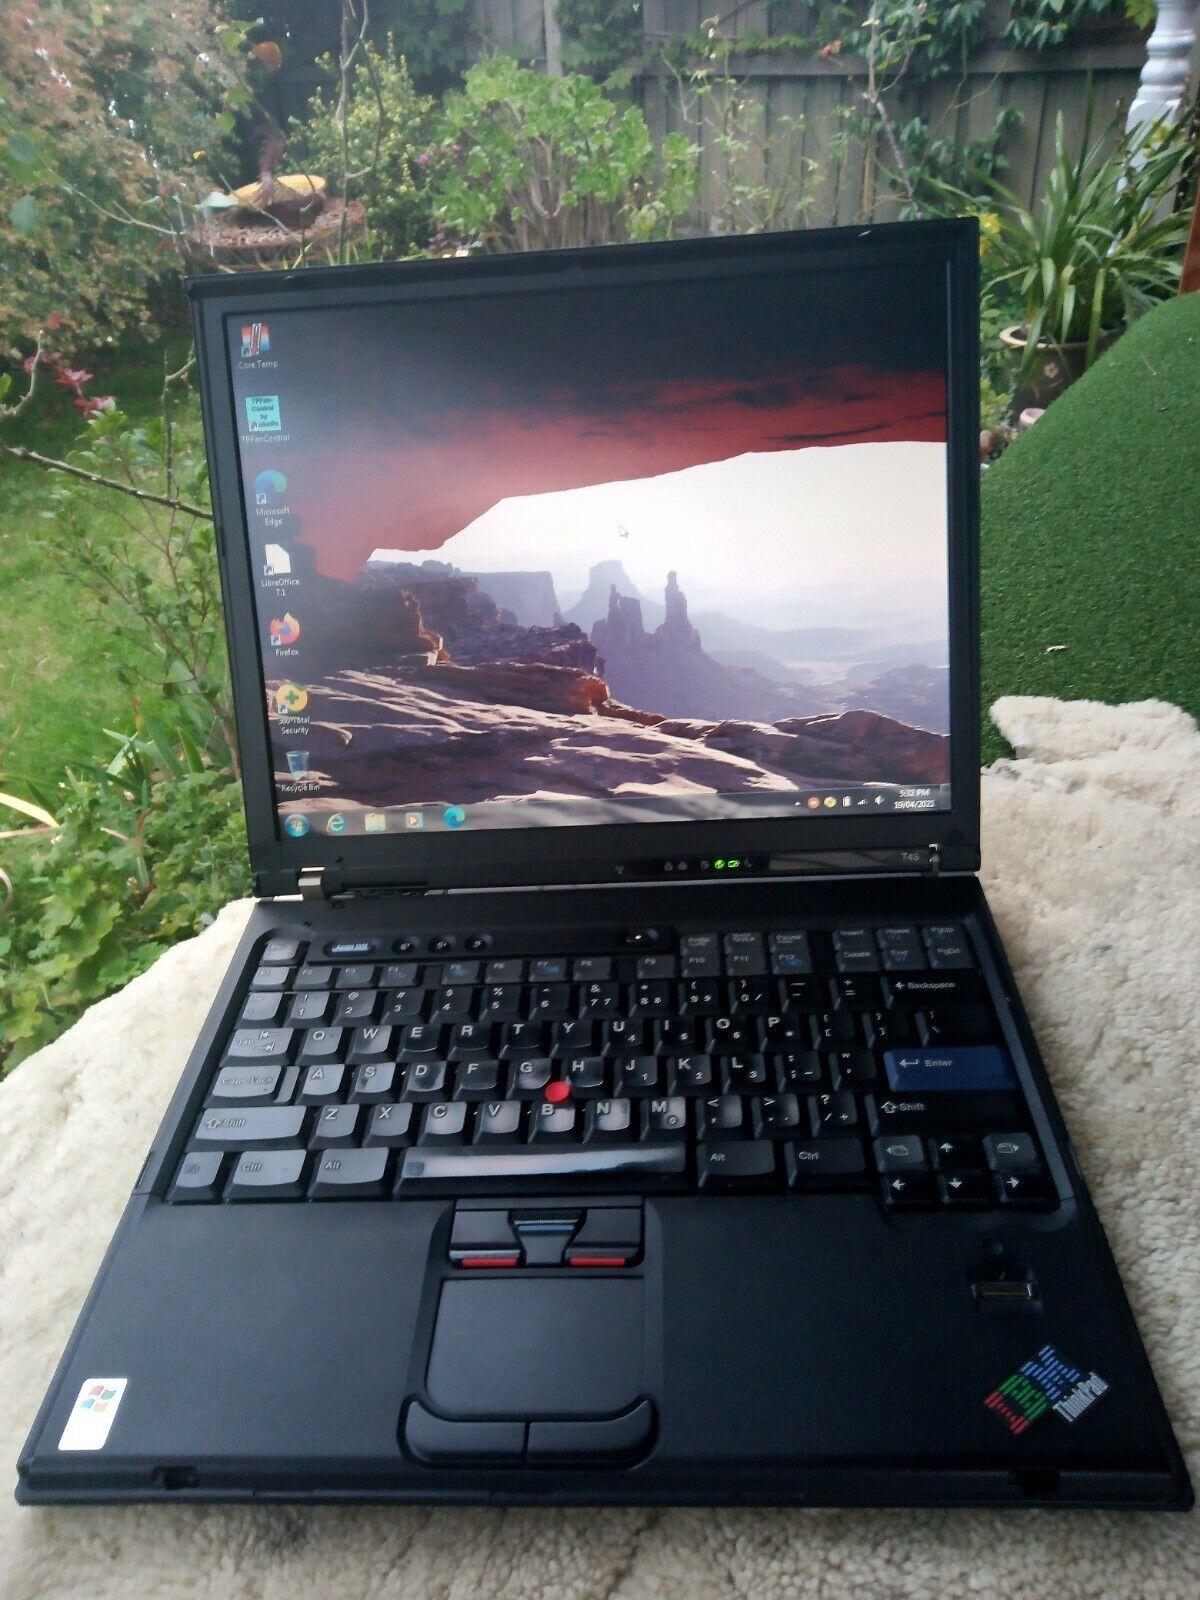 "Laptop Windows - Classic IBM T43 Thinkpad 14"" laptop, EC with Windows 7 Pro SP1 and LibreOffice"